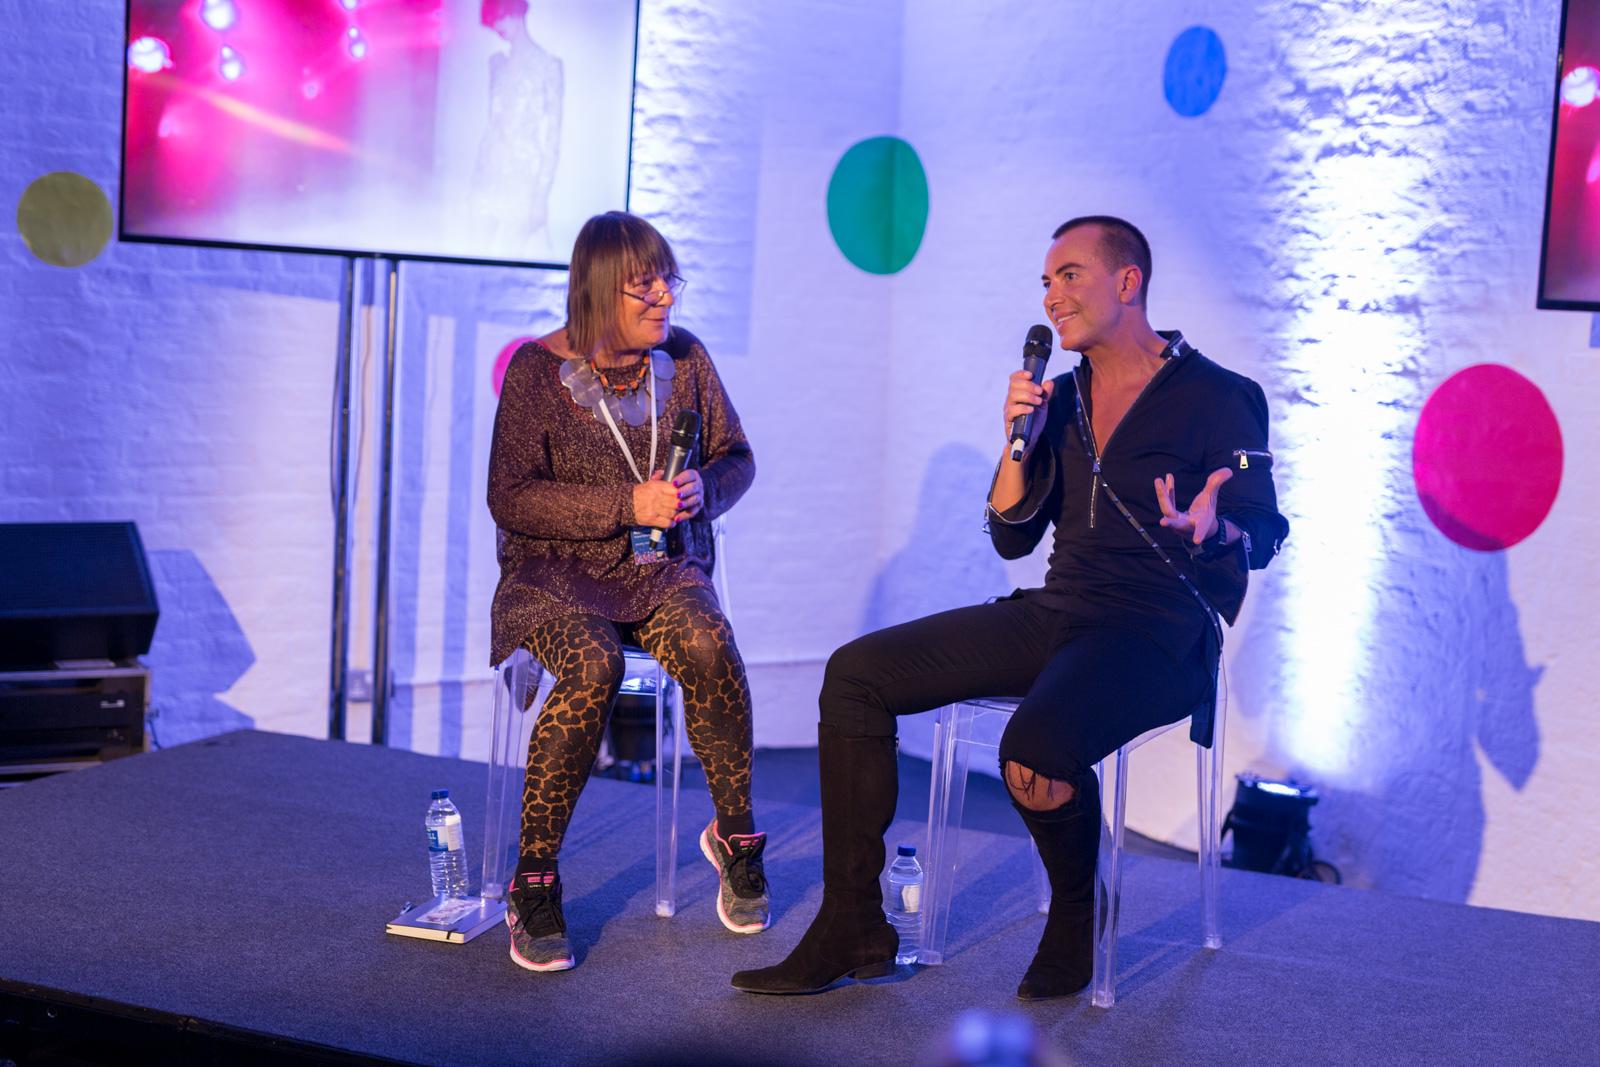 (Julien Macdonald in conversation with Hilary Alexander OBE The career of the King of Glamour by Debenhams) (Debenhams)  (06-06-2017) (image by Qavi Reyez)_-6.jpg